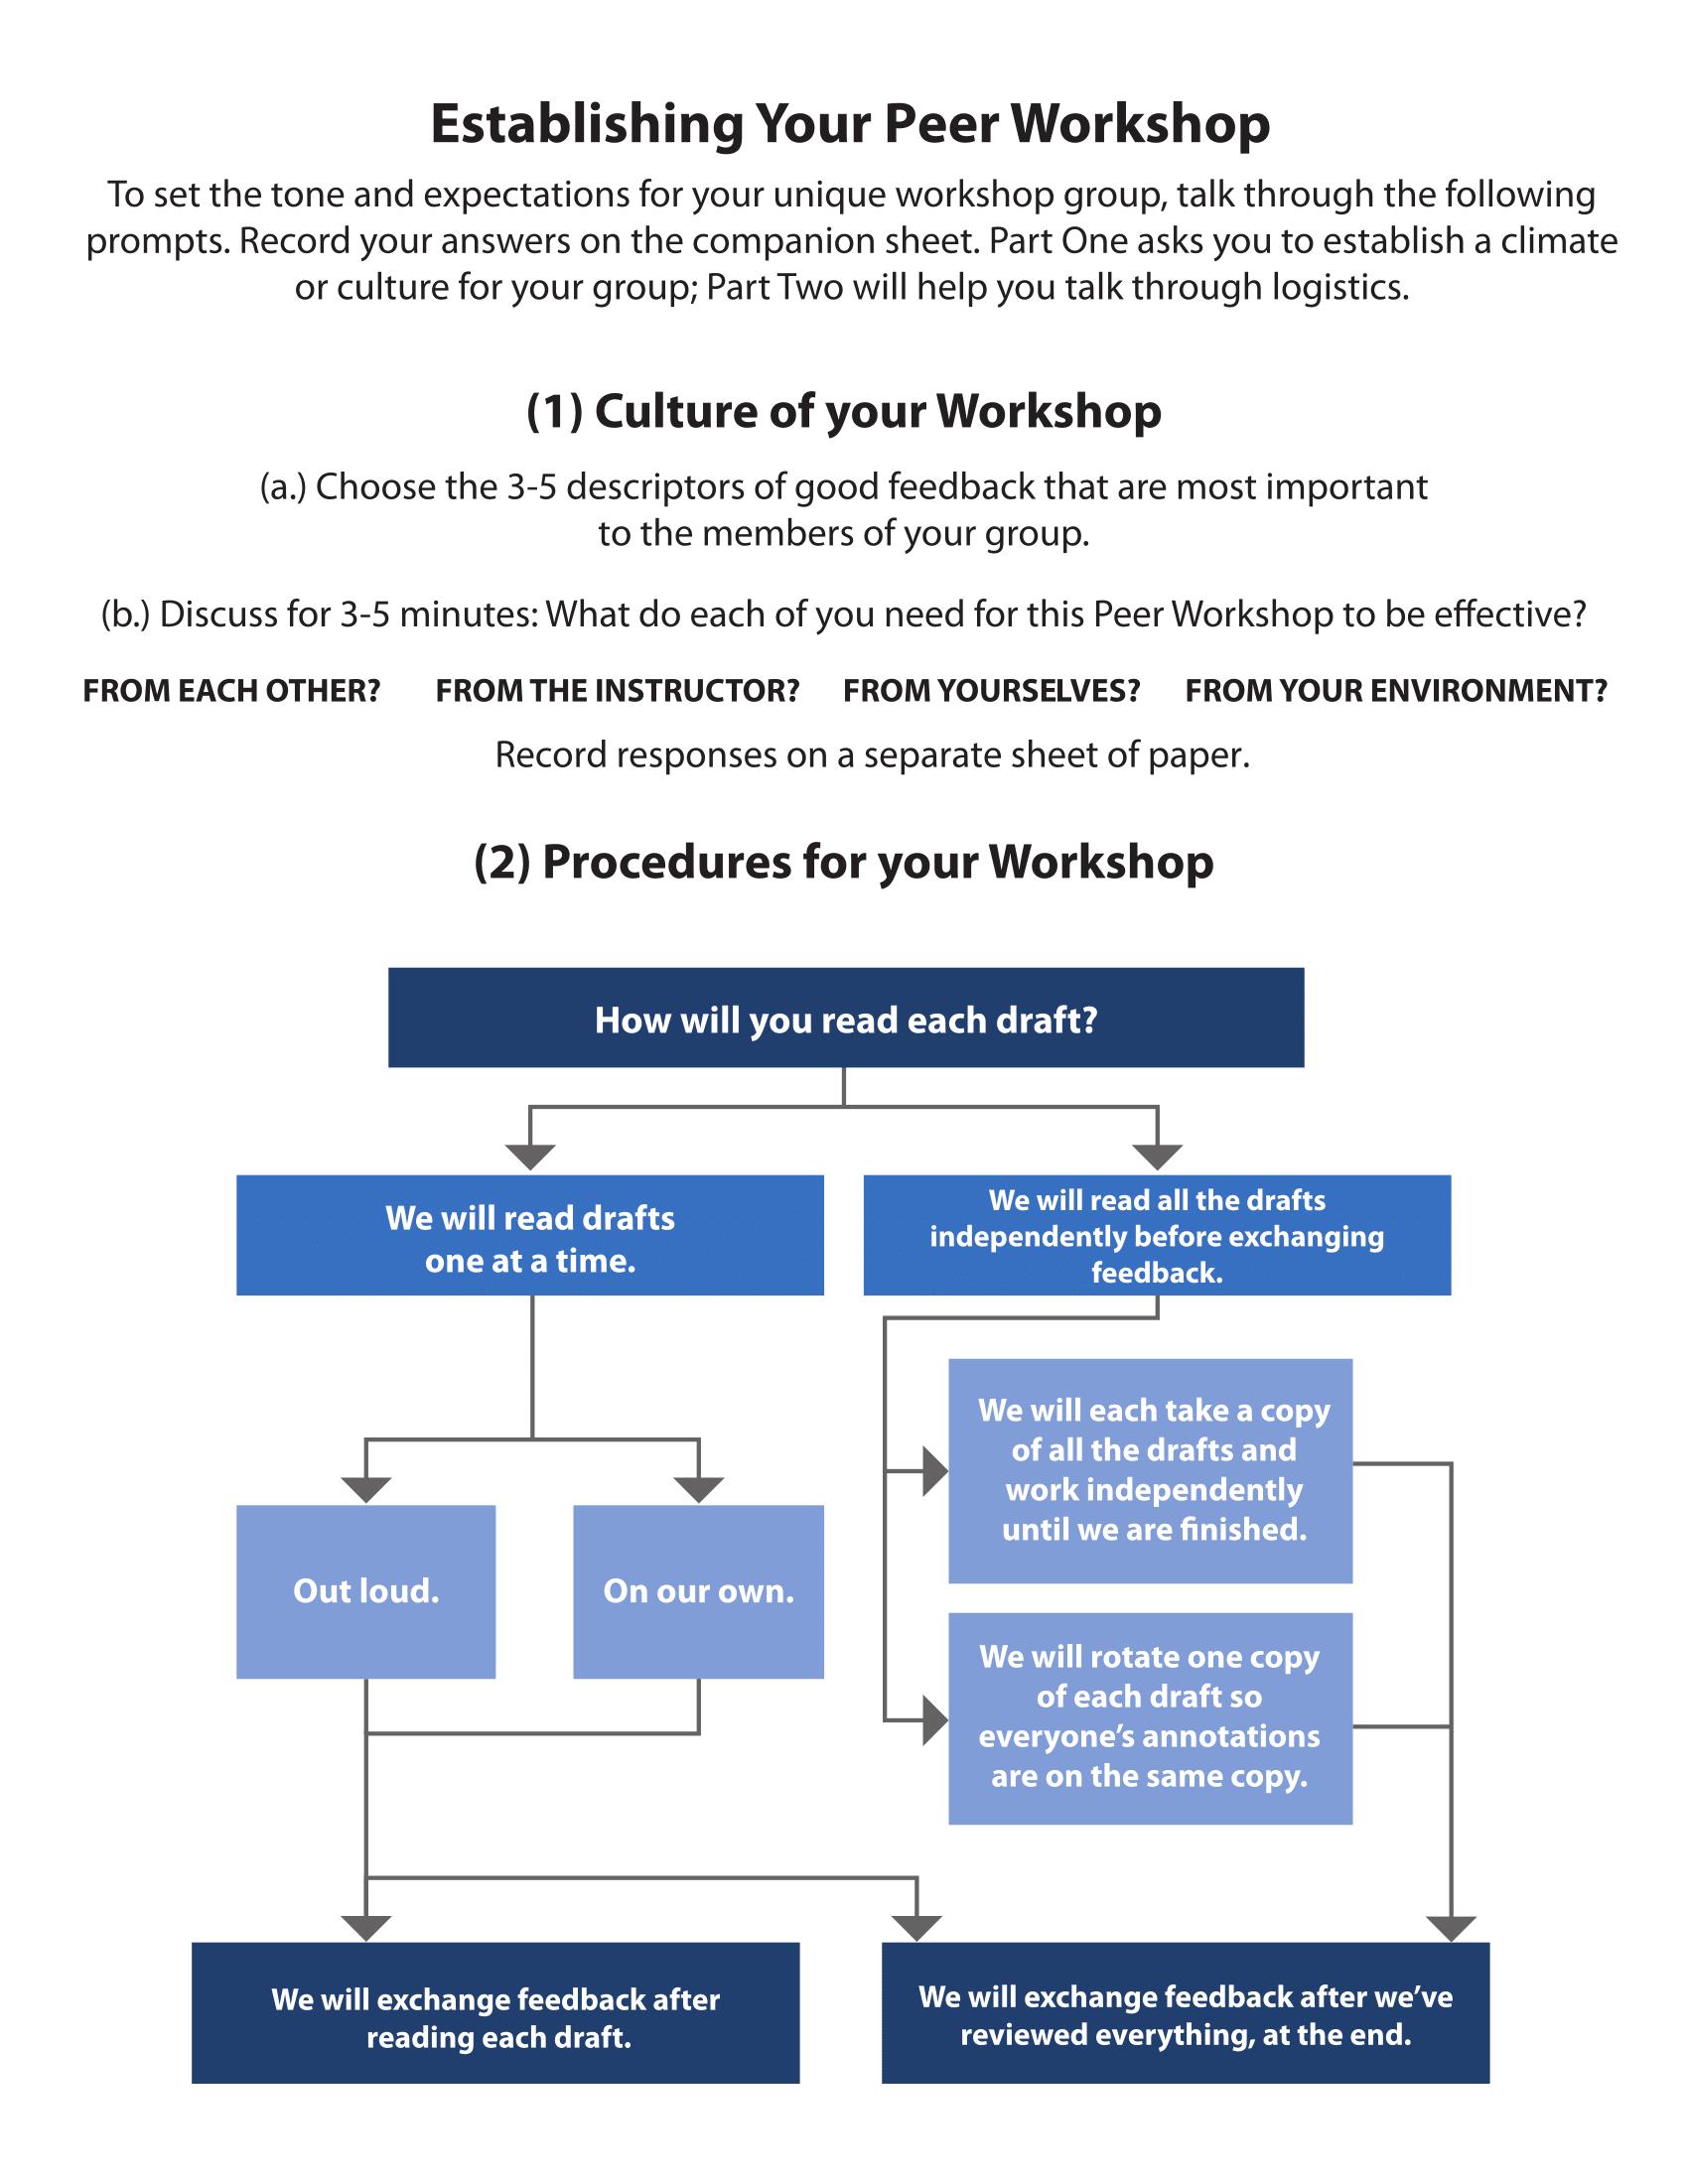 Thumbnail of Establishing Your Peer Workshop flowchart. For accessible version, contact pdxscholar@pdx.edu.